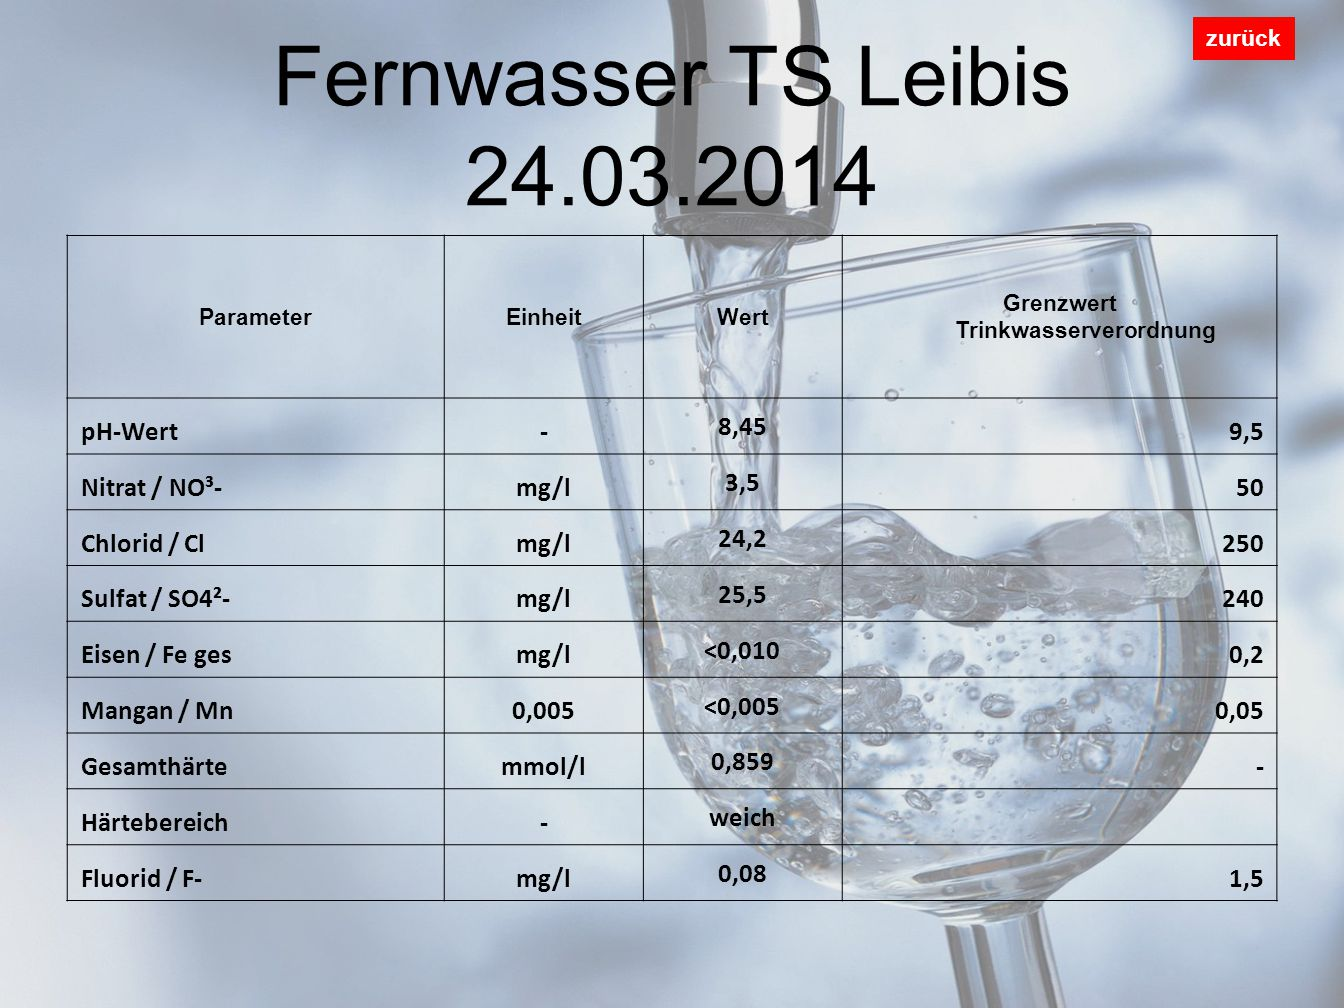 Fernwasser TS Leibis 24.03.2014 zurück ParameterEinheitWert Grenzwert Trinkwasserverordnung pH-Wert- 8,45 9,5 Nitrat / NO³-mg/l 3,5 50 Chlorid / Clmg/